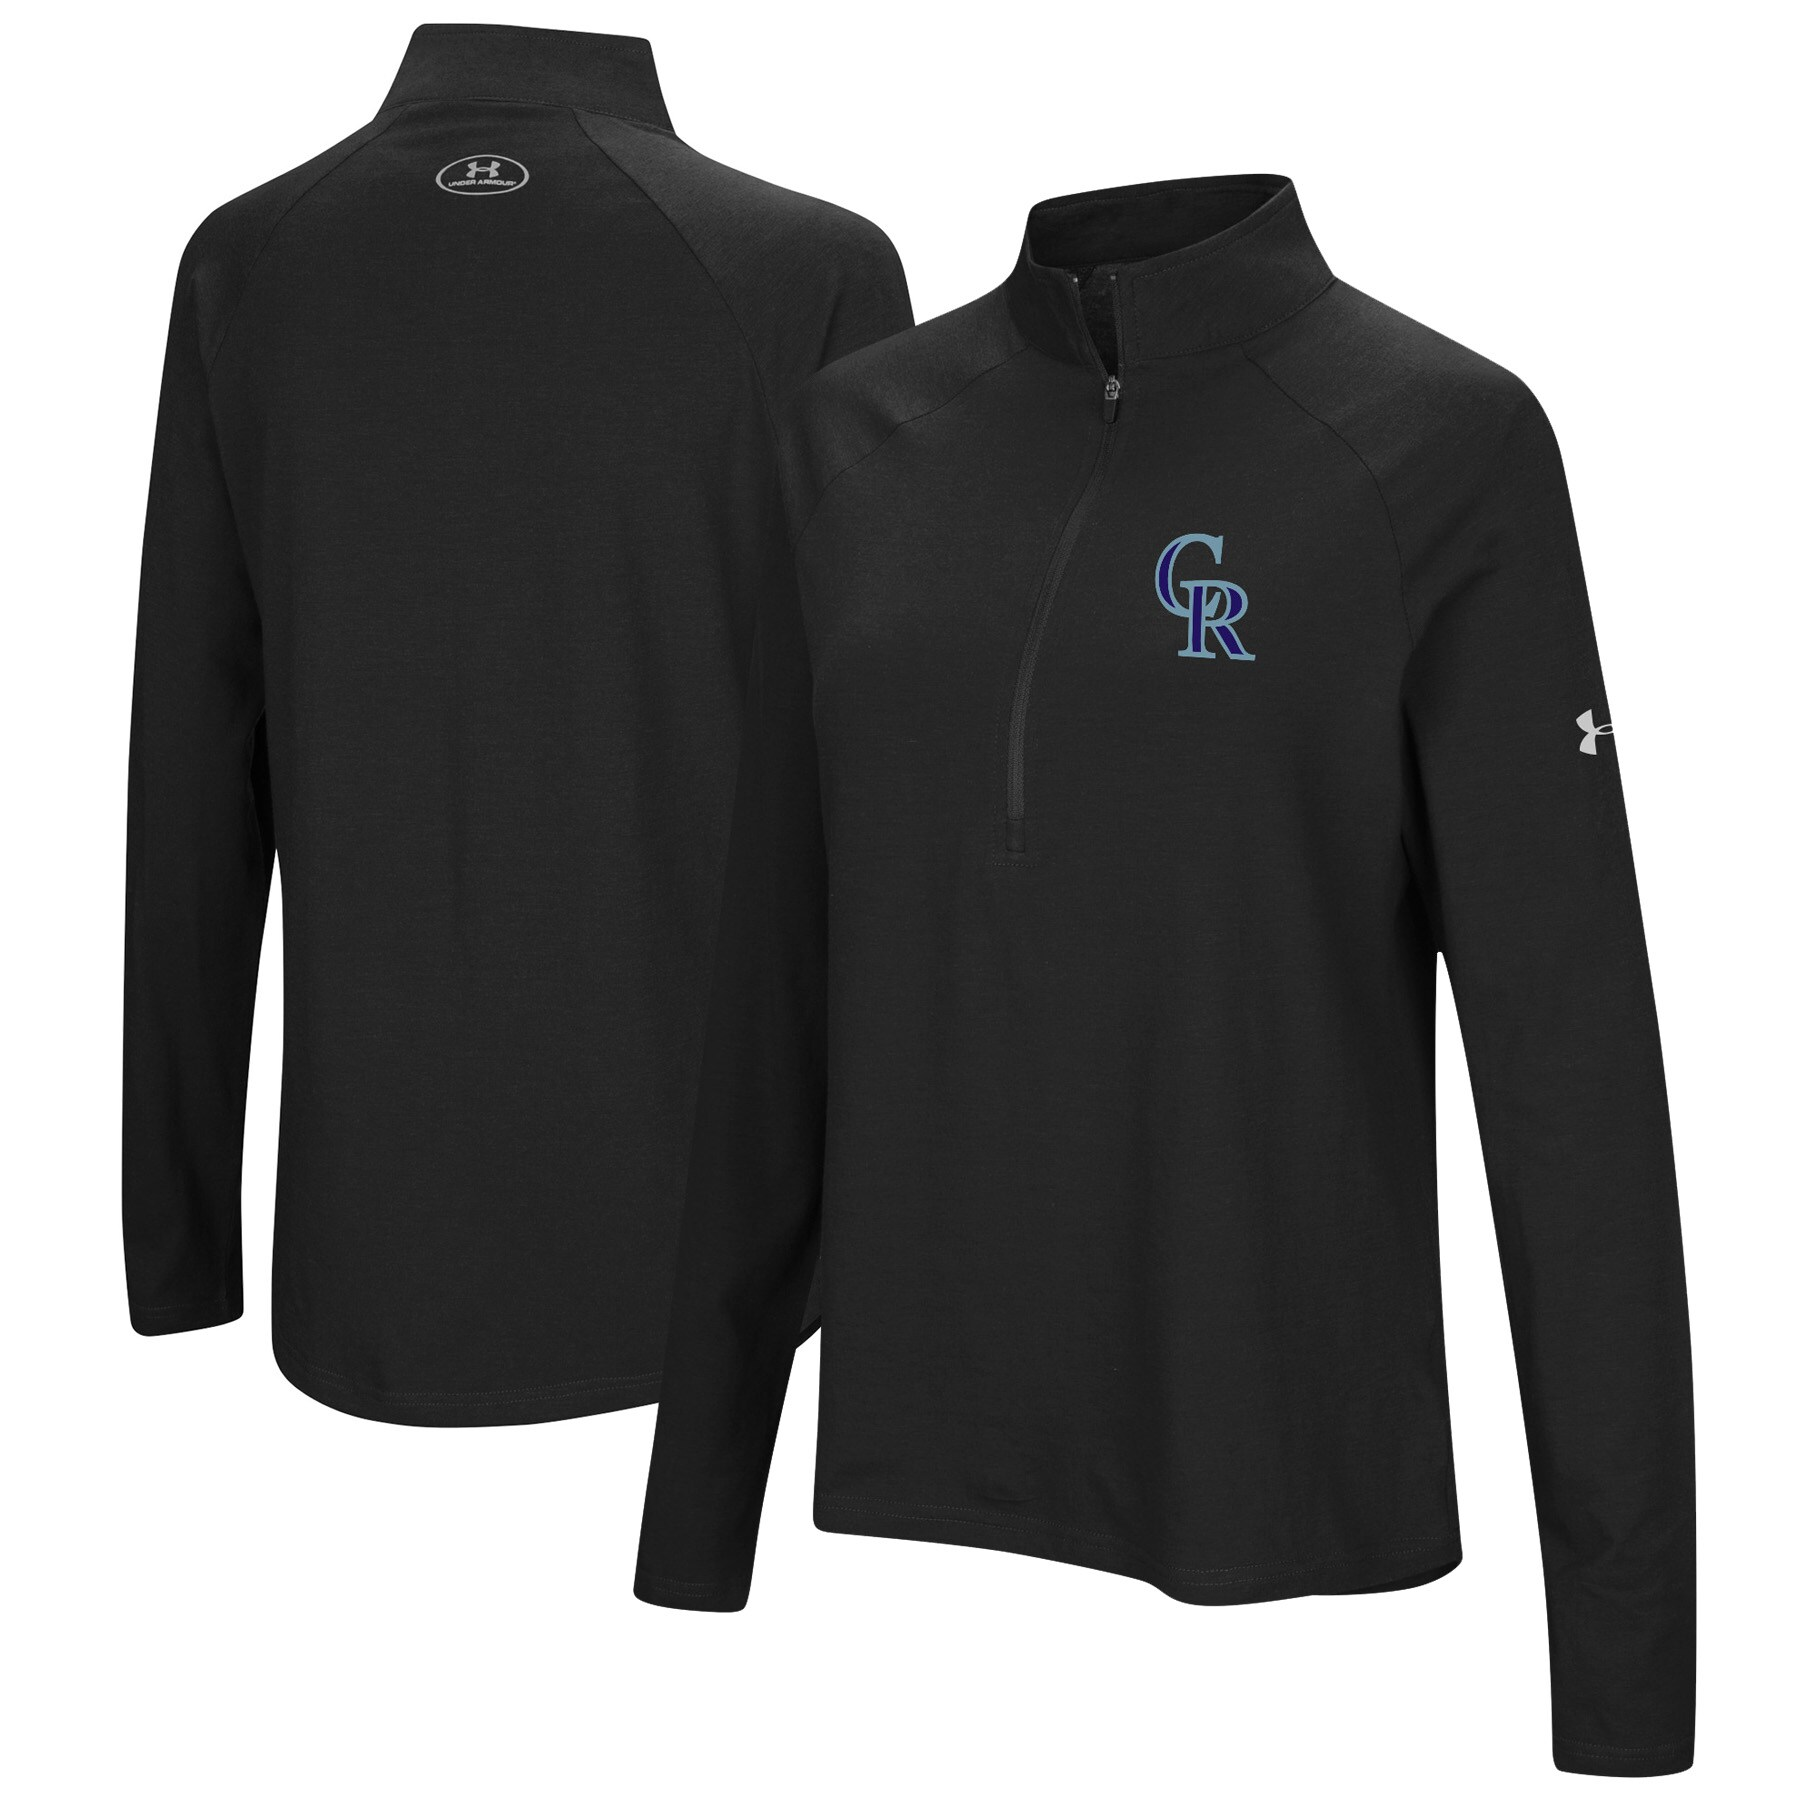 Colorado Rockies Under Armour Women's Passion Performance Tri-Blend Raglan Half-Zip Pullover Jacket - Black